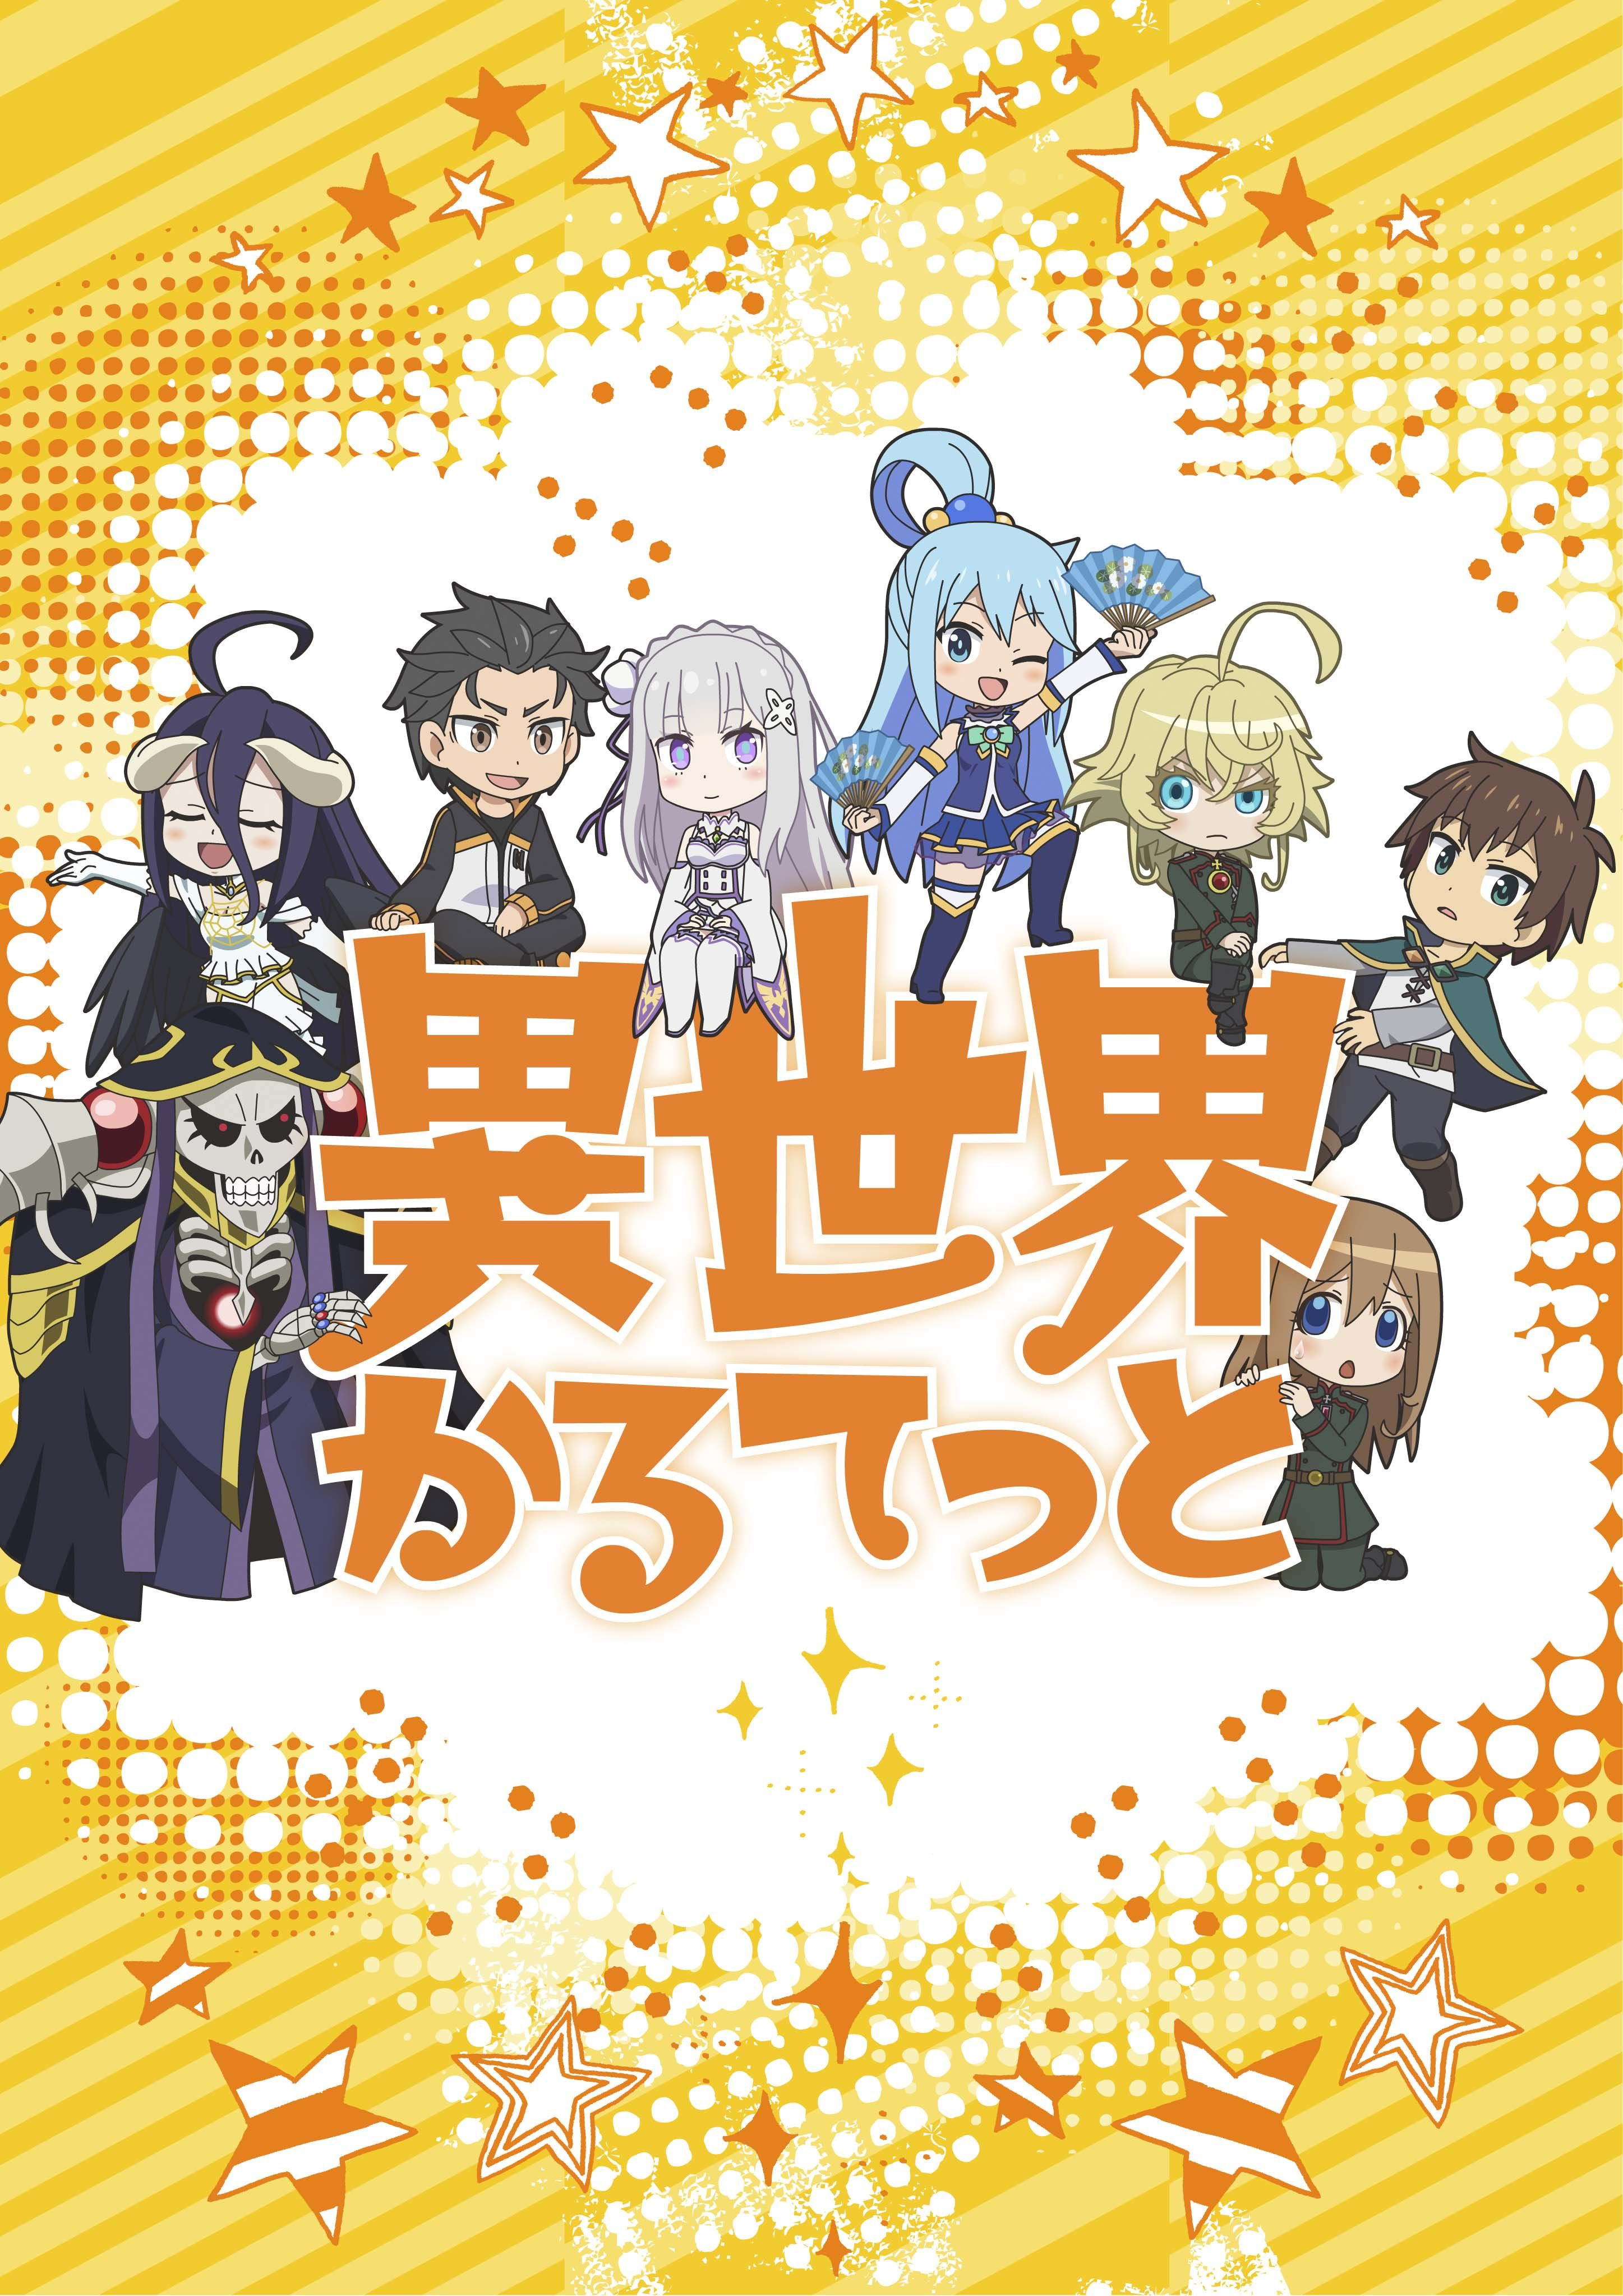 Isekai Quartet 01 12 Anime, Overlord anime season 2